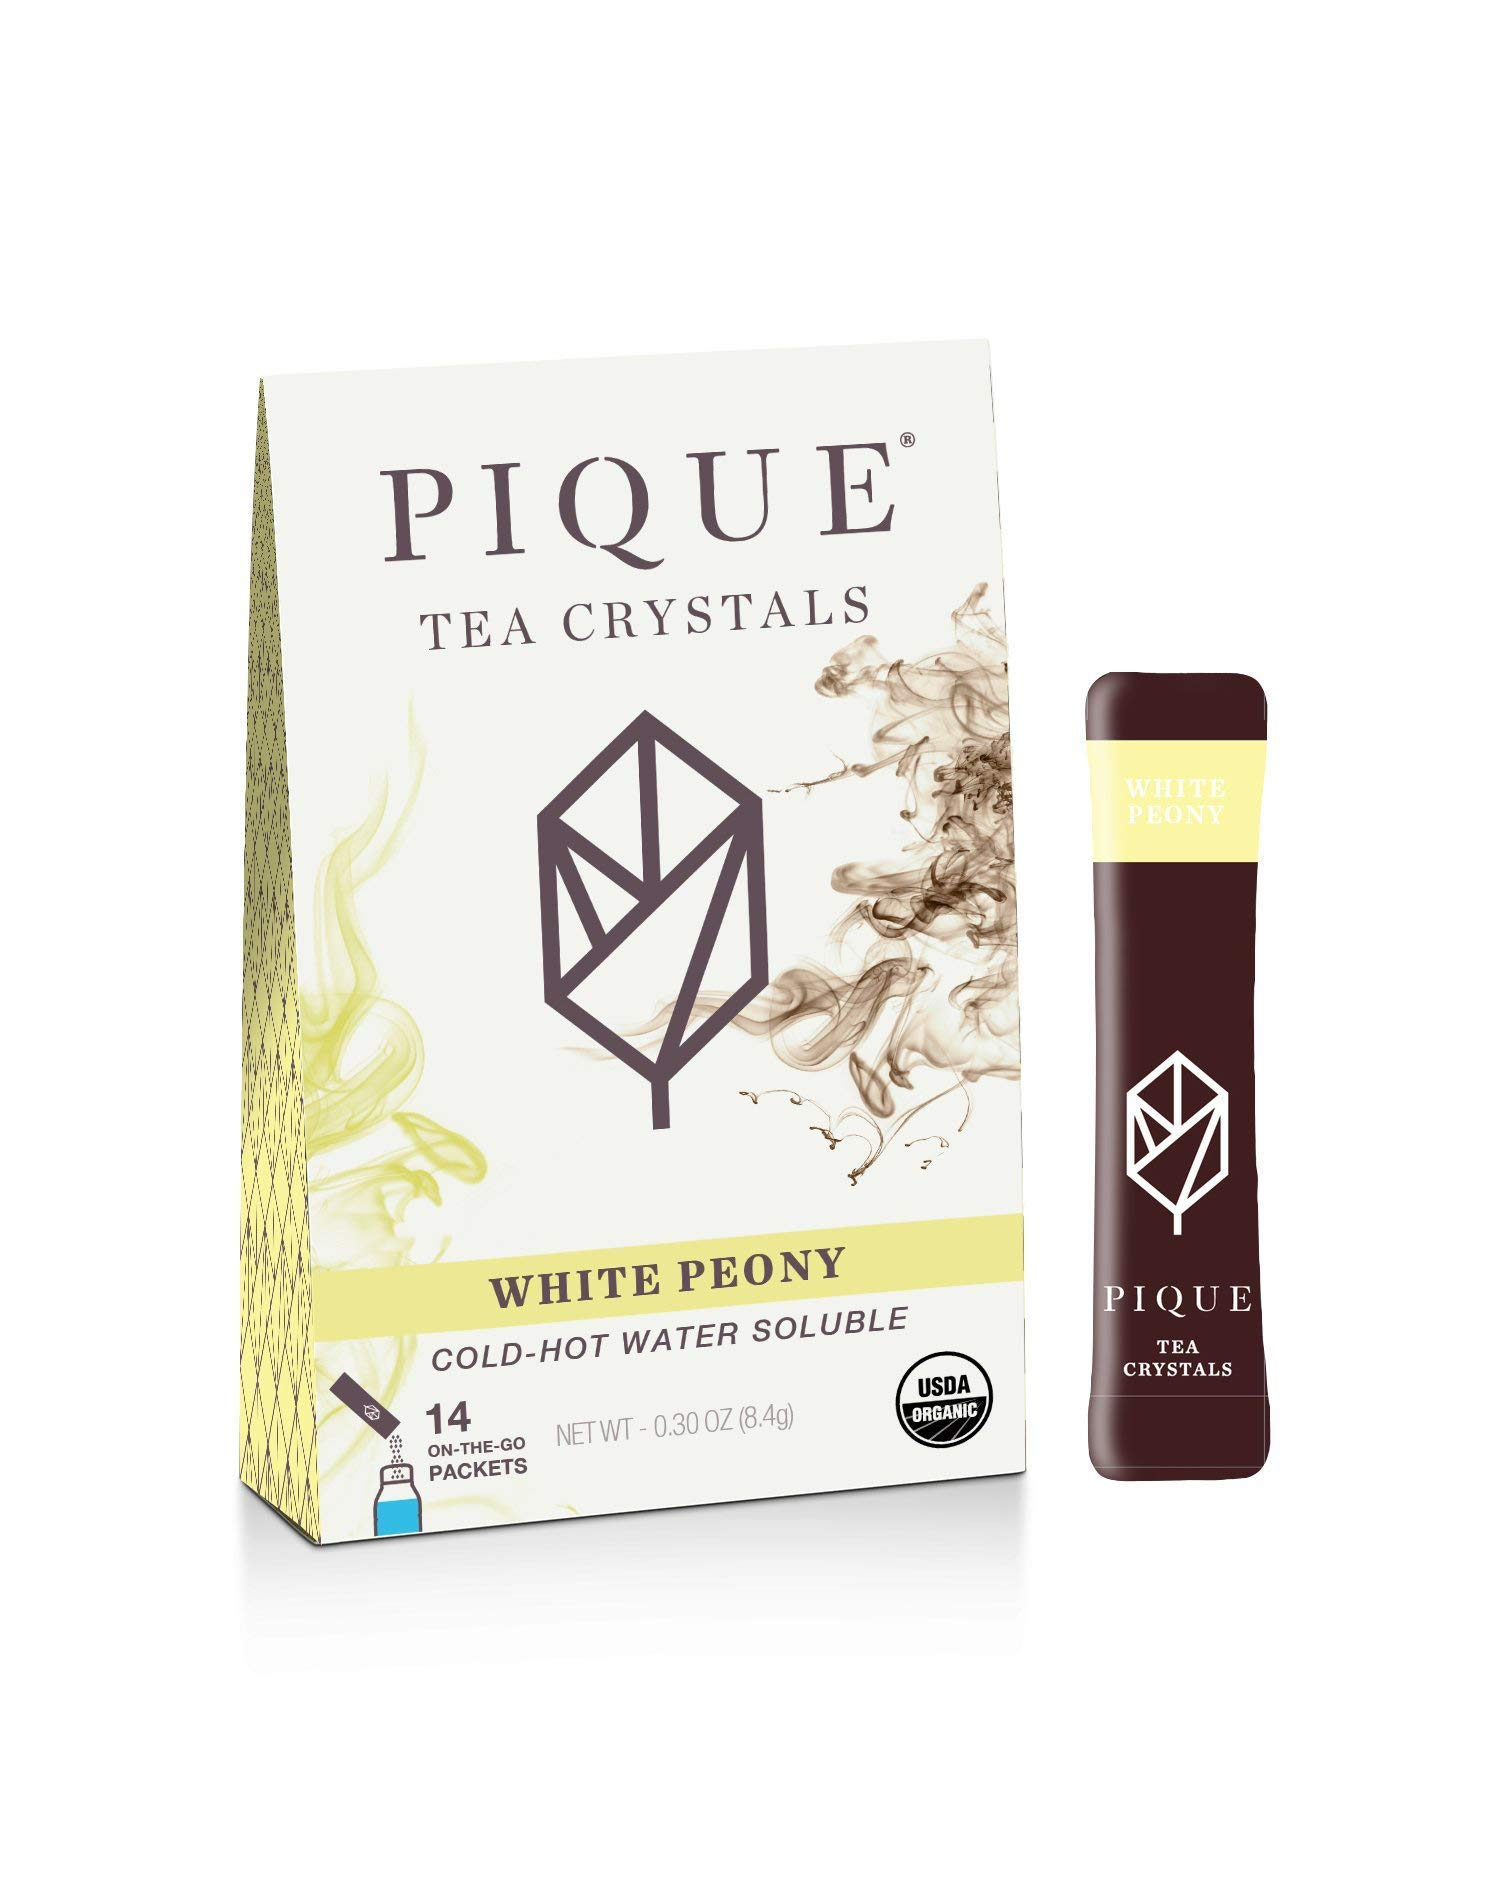 Pique Tea Organic White Tea Crystals - Radiant Skin, Immune Support, Calm - 1 Pack (14 sticks)